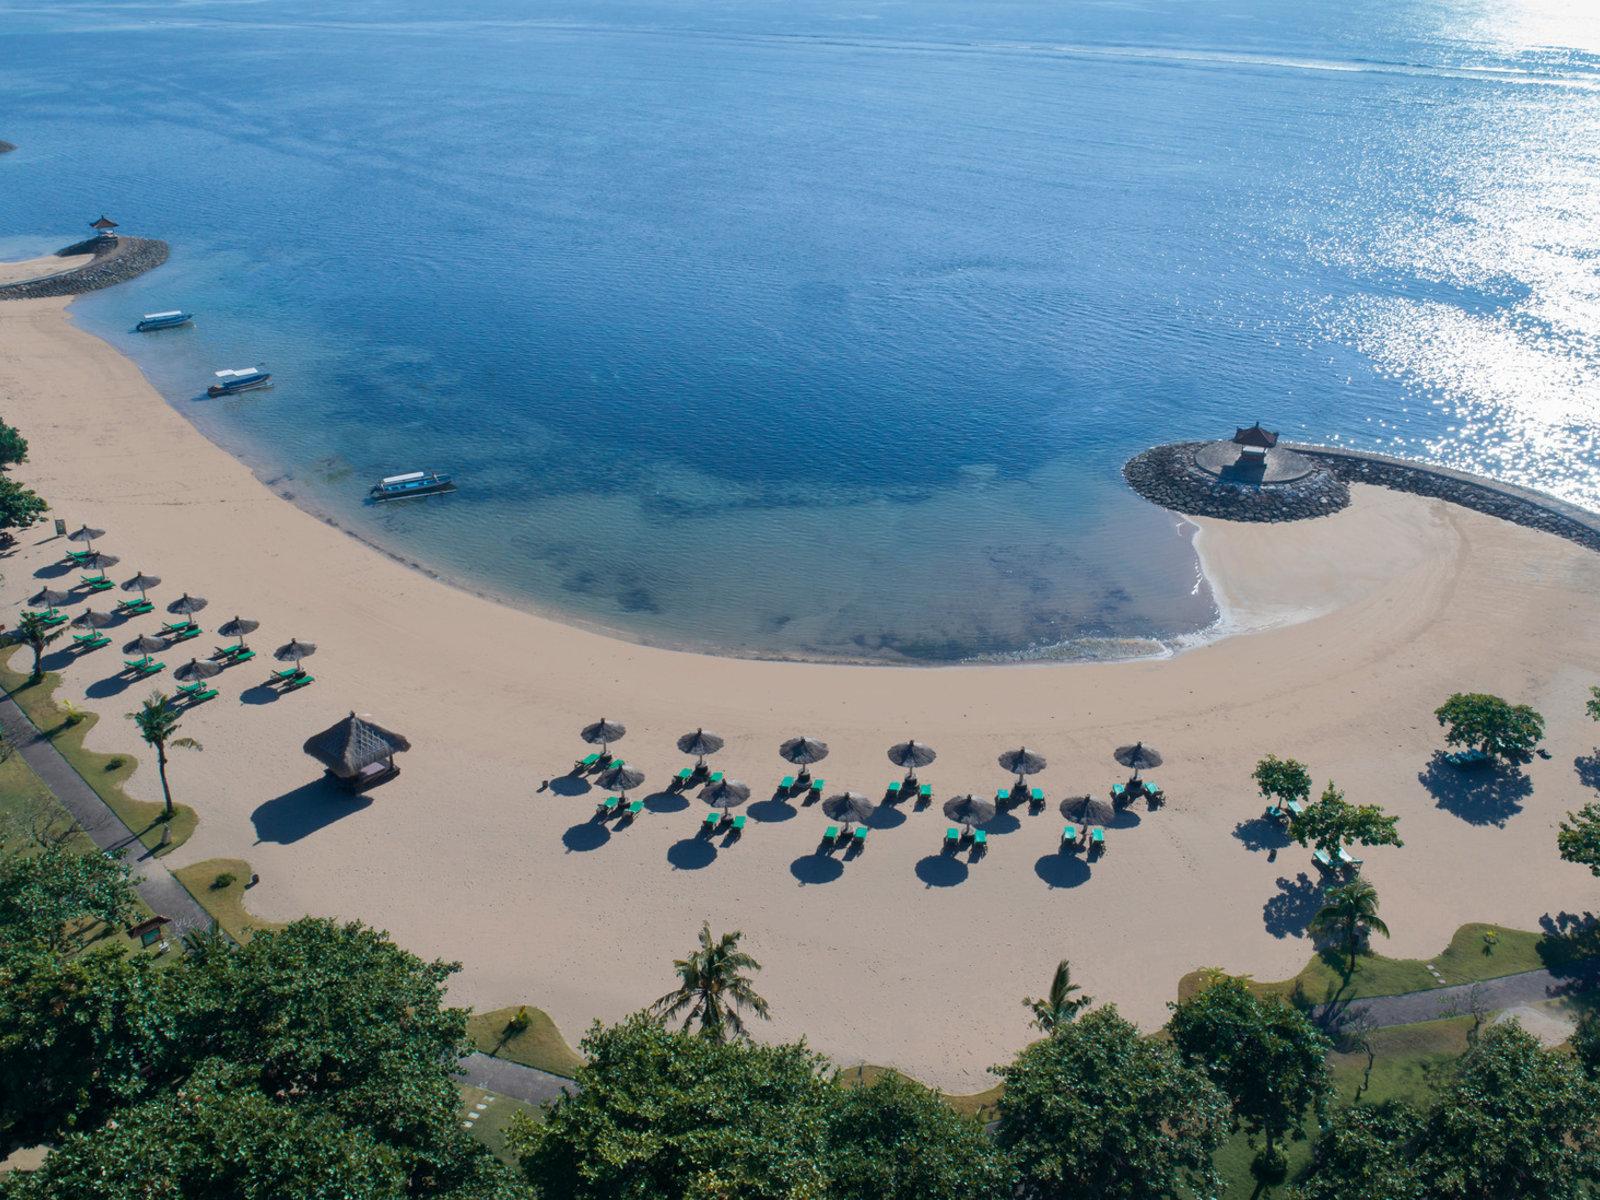 Tanjung Benoa Beach